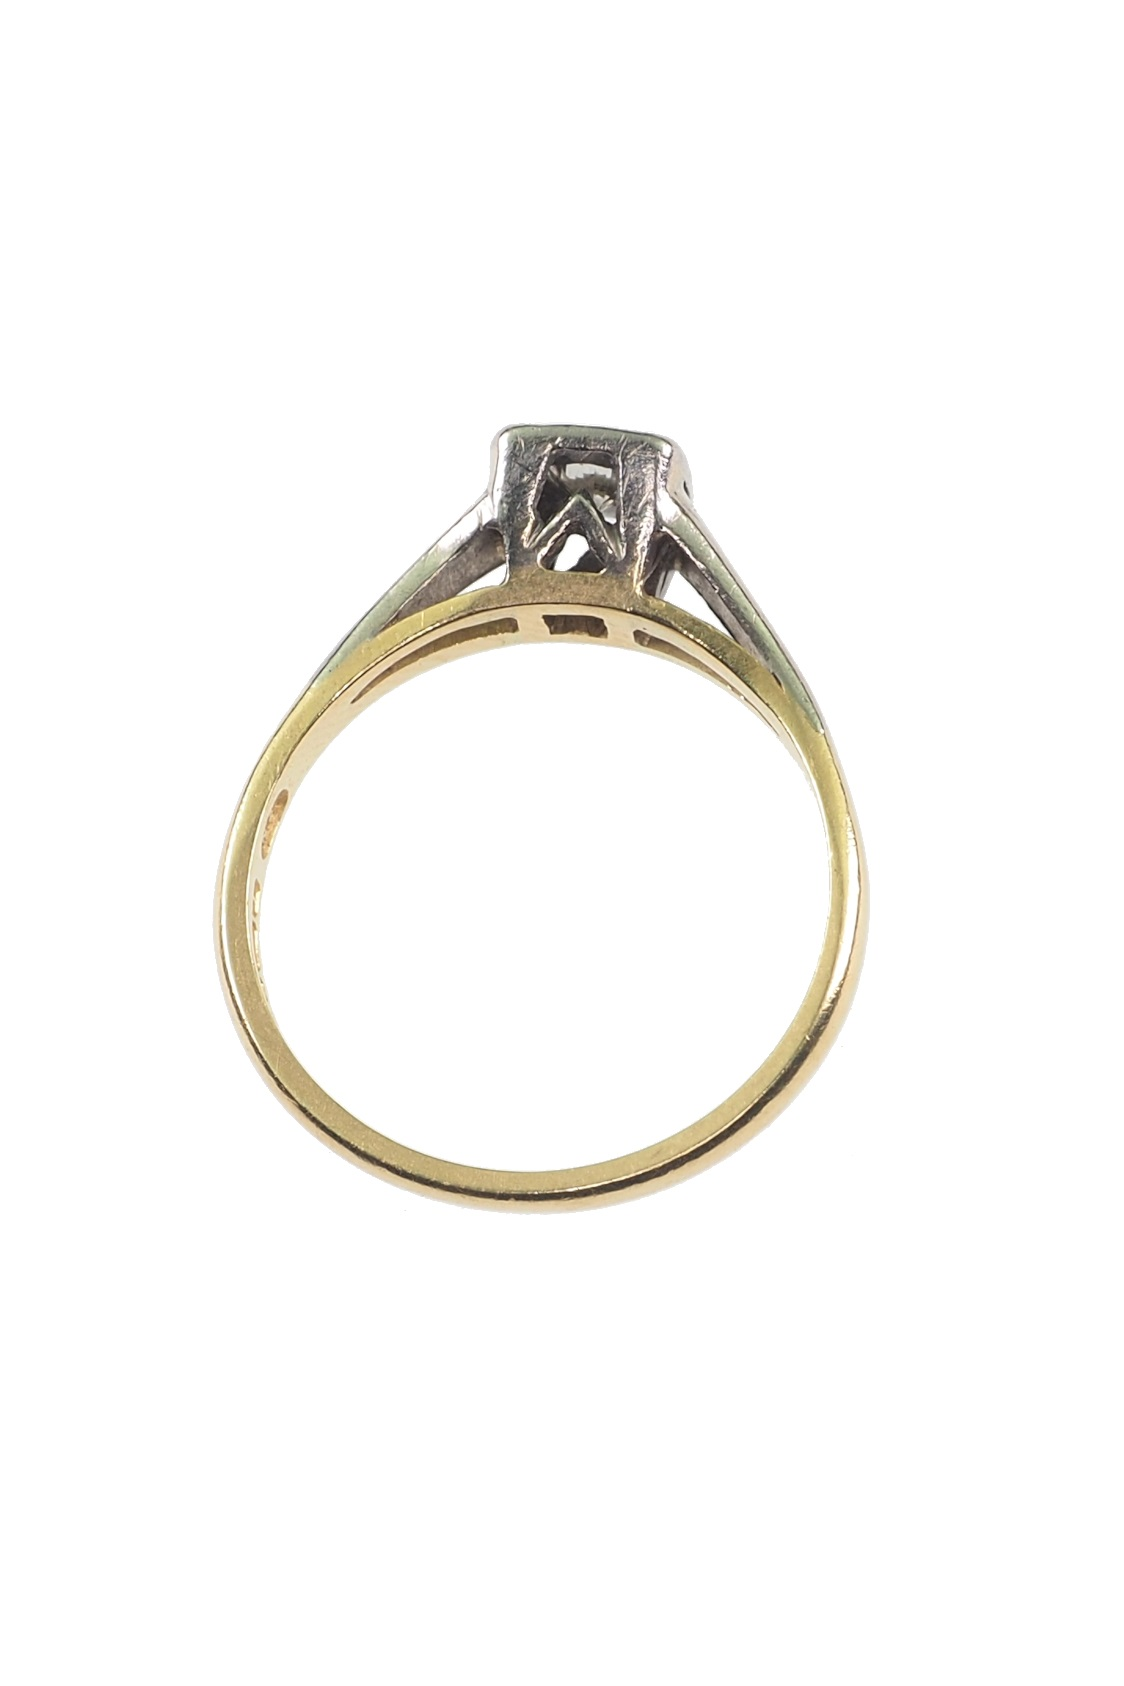 antike-Verlobungsringe-kaufen-0592b